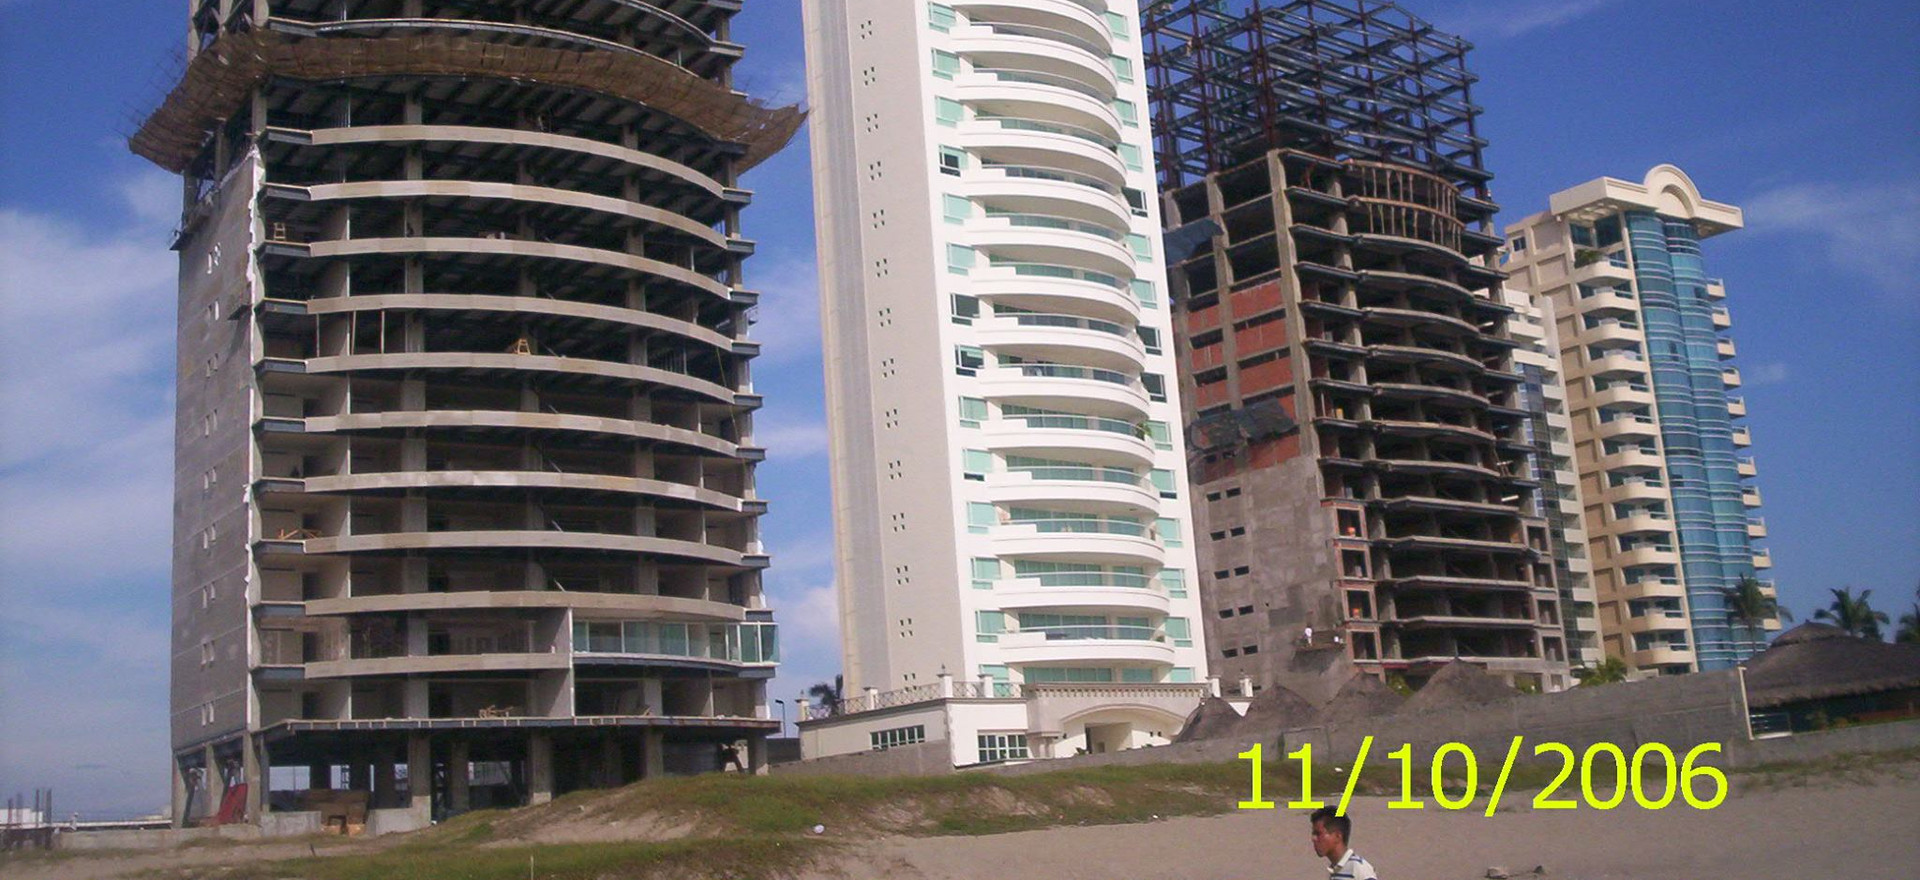 Amarinthos 1 y 2, Acapulco